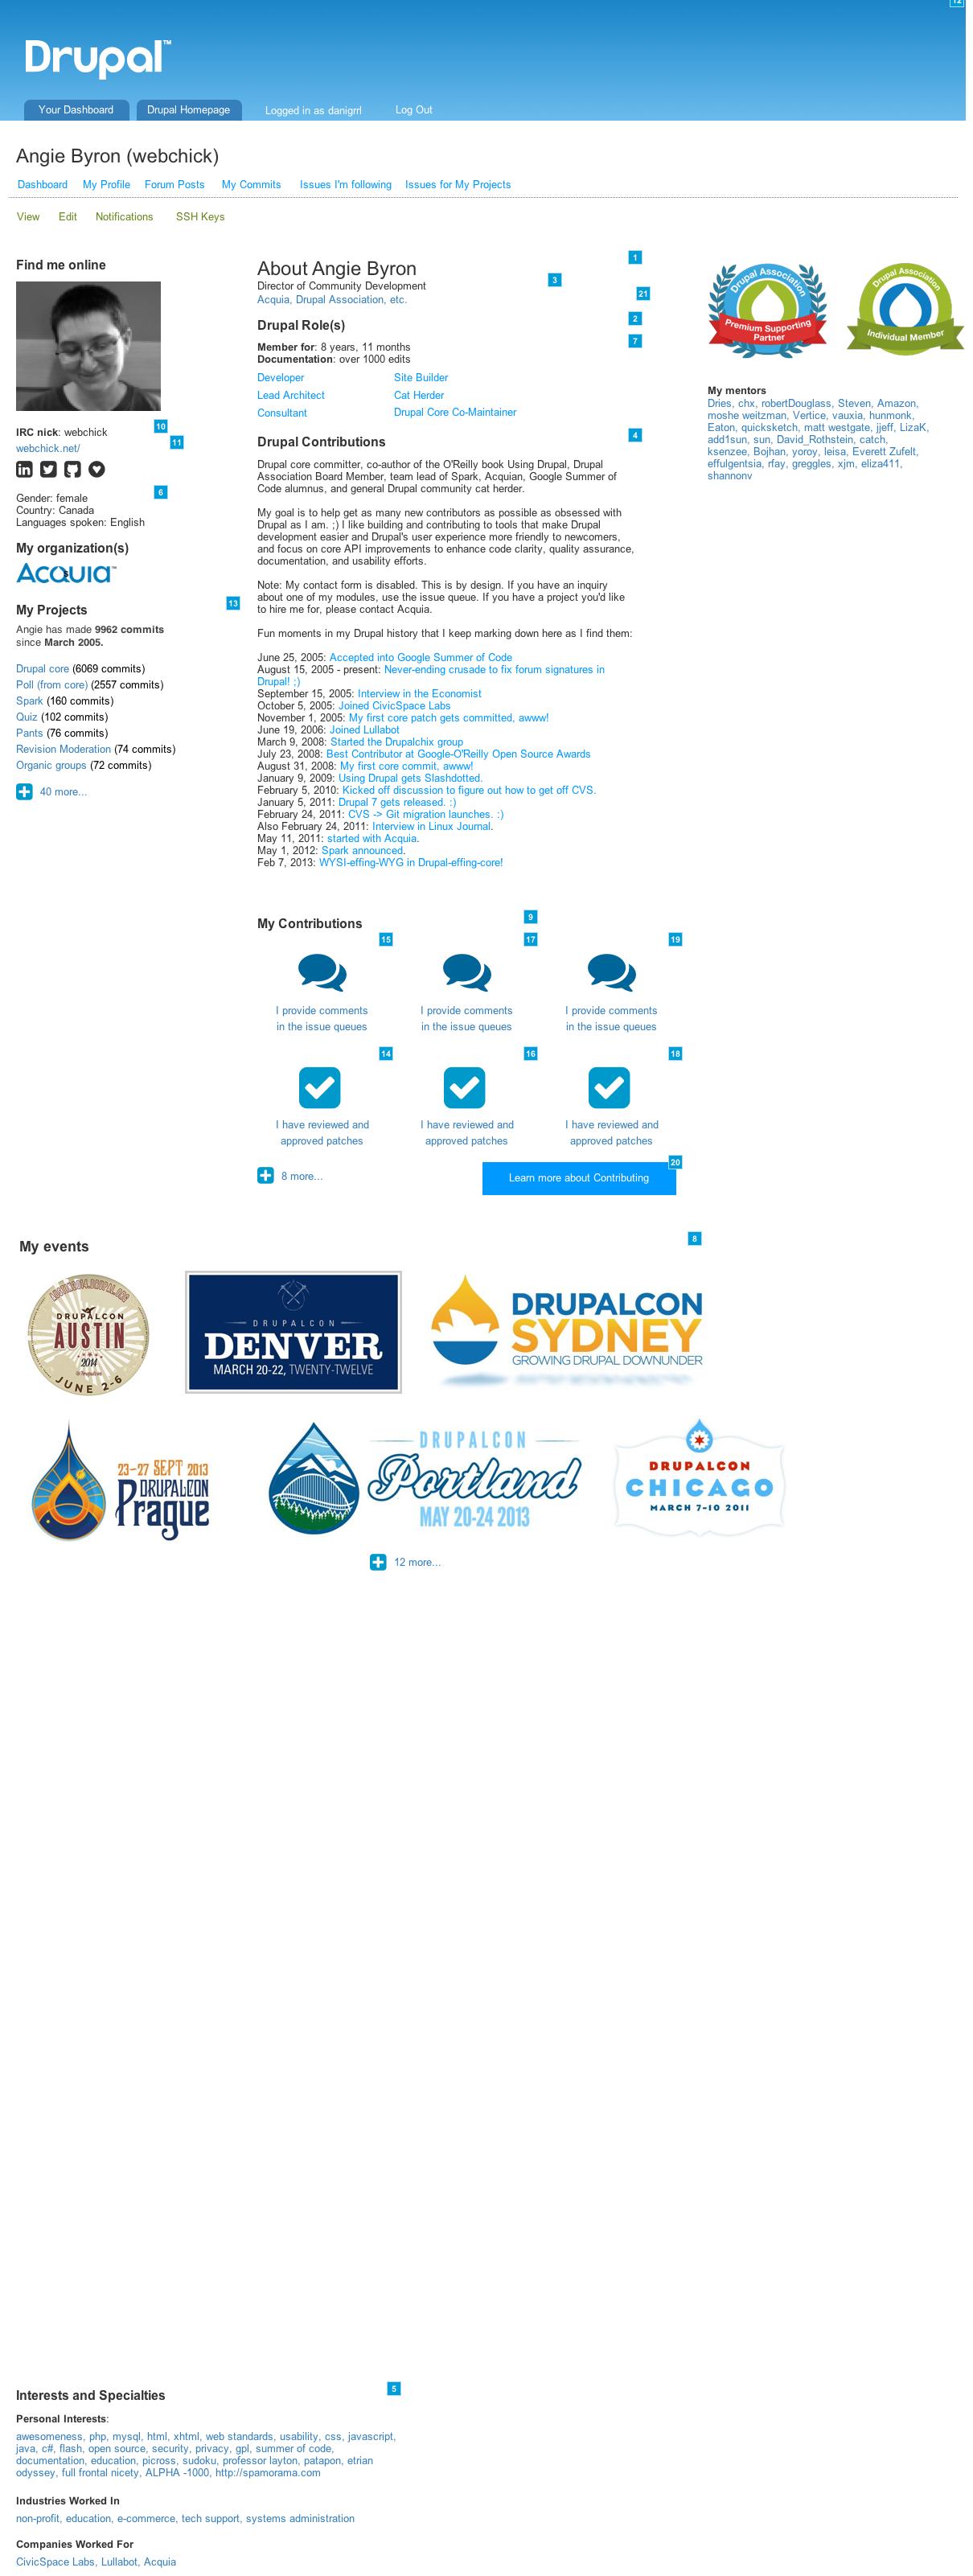 Make drupal user profiles more robust 2281763 drupal 7 profilehighcodecontributorg xflitez Gallery